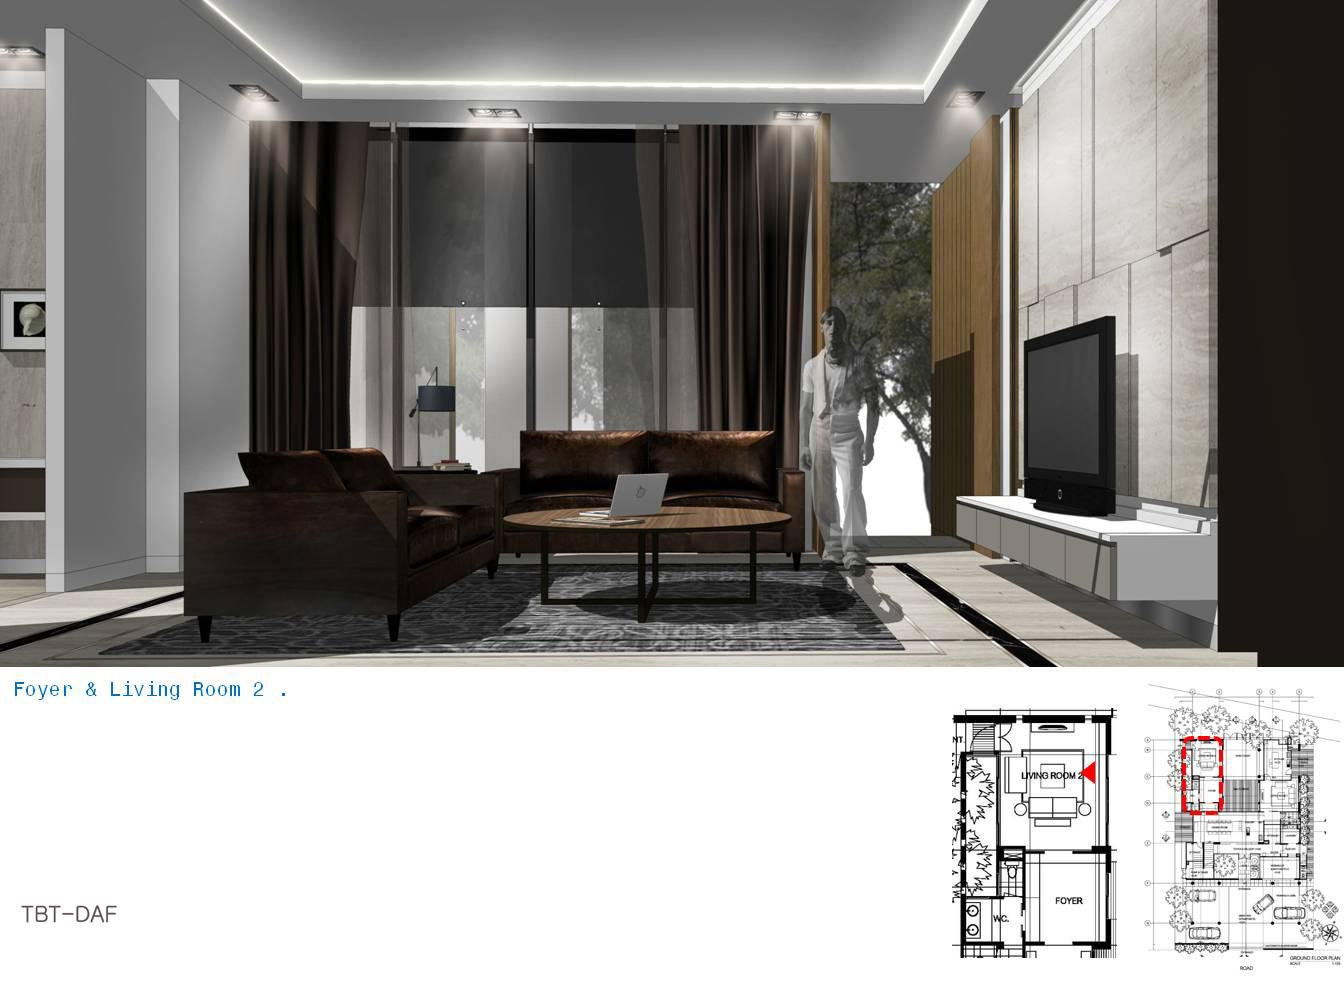 TBT-DAF interior design house robinson 10